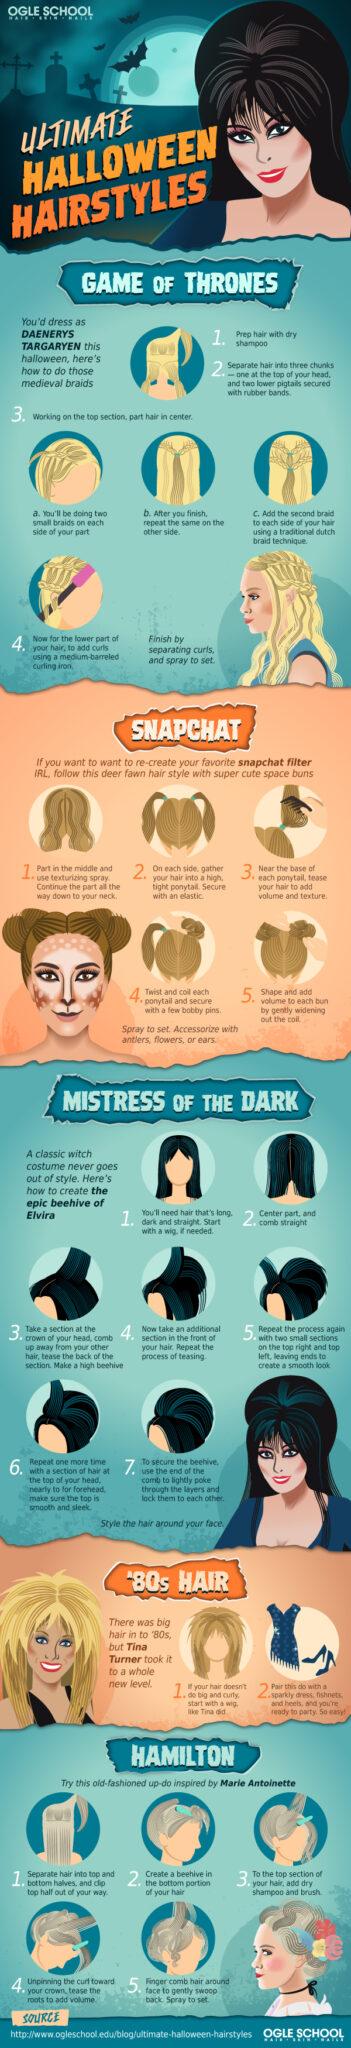 Ultimate Halloween Hairstyles_IG